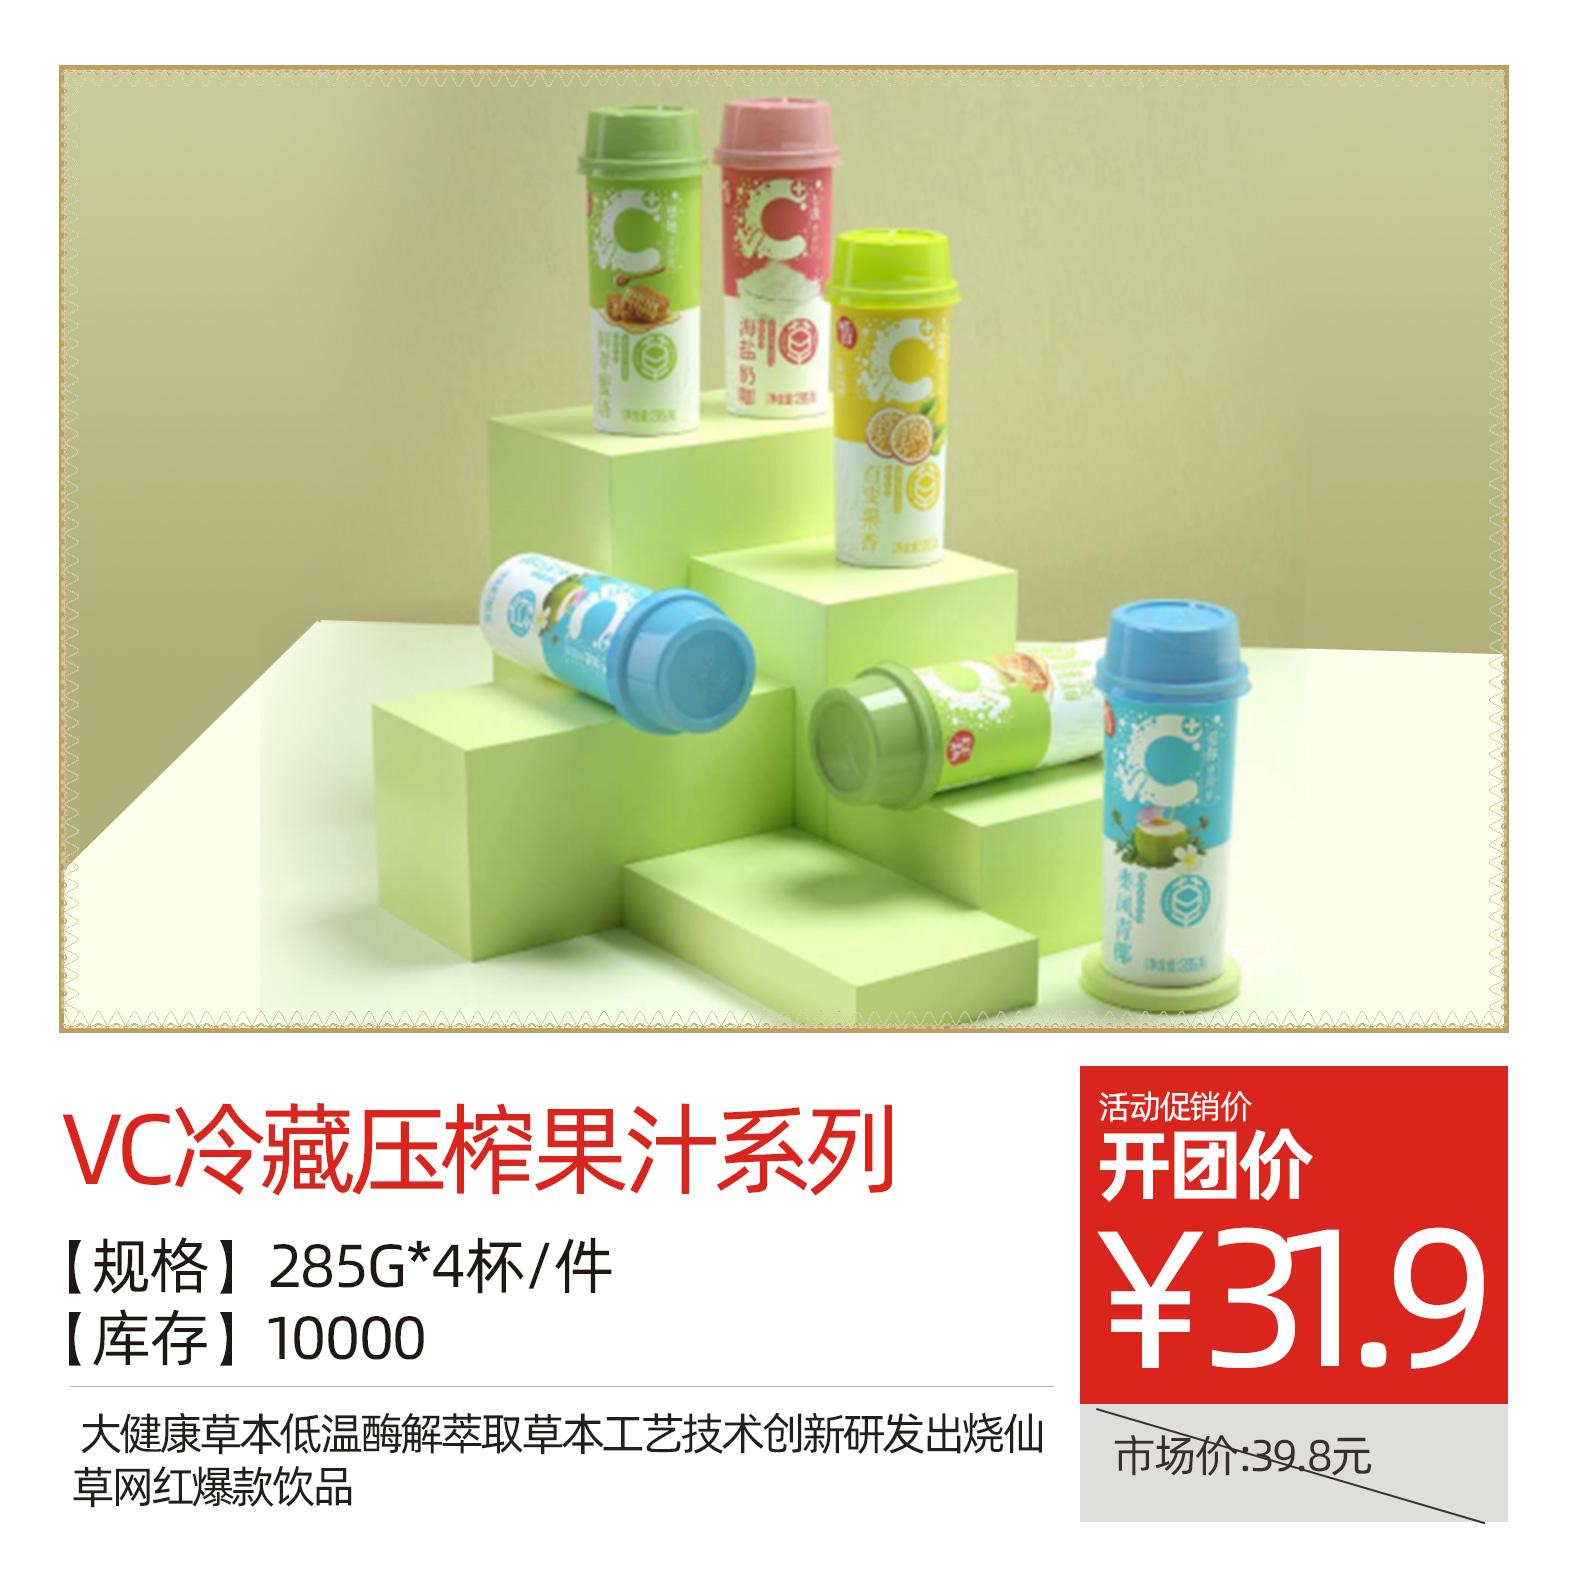 VC冷藏压榨果汁系列